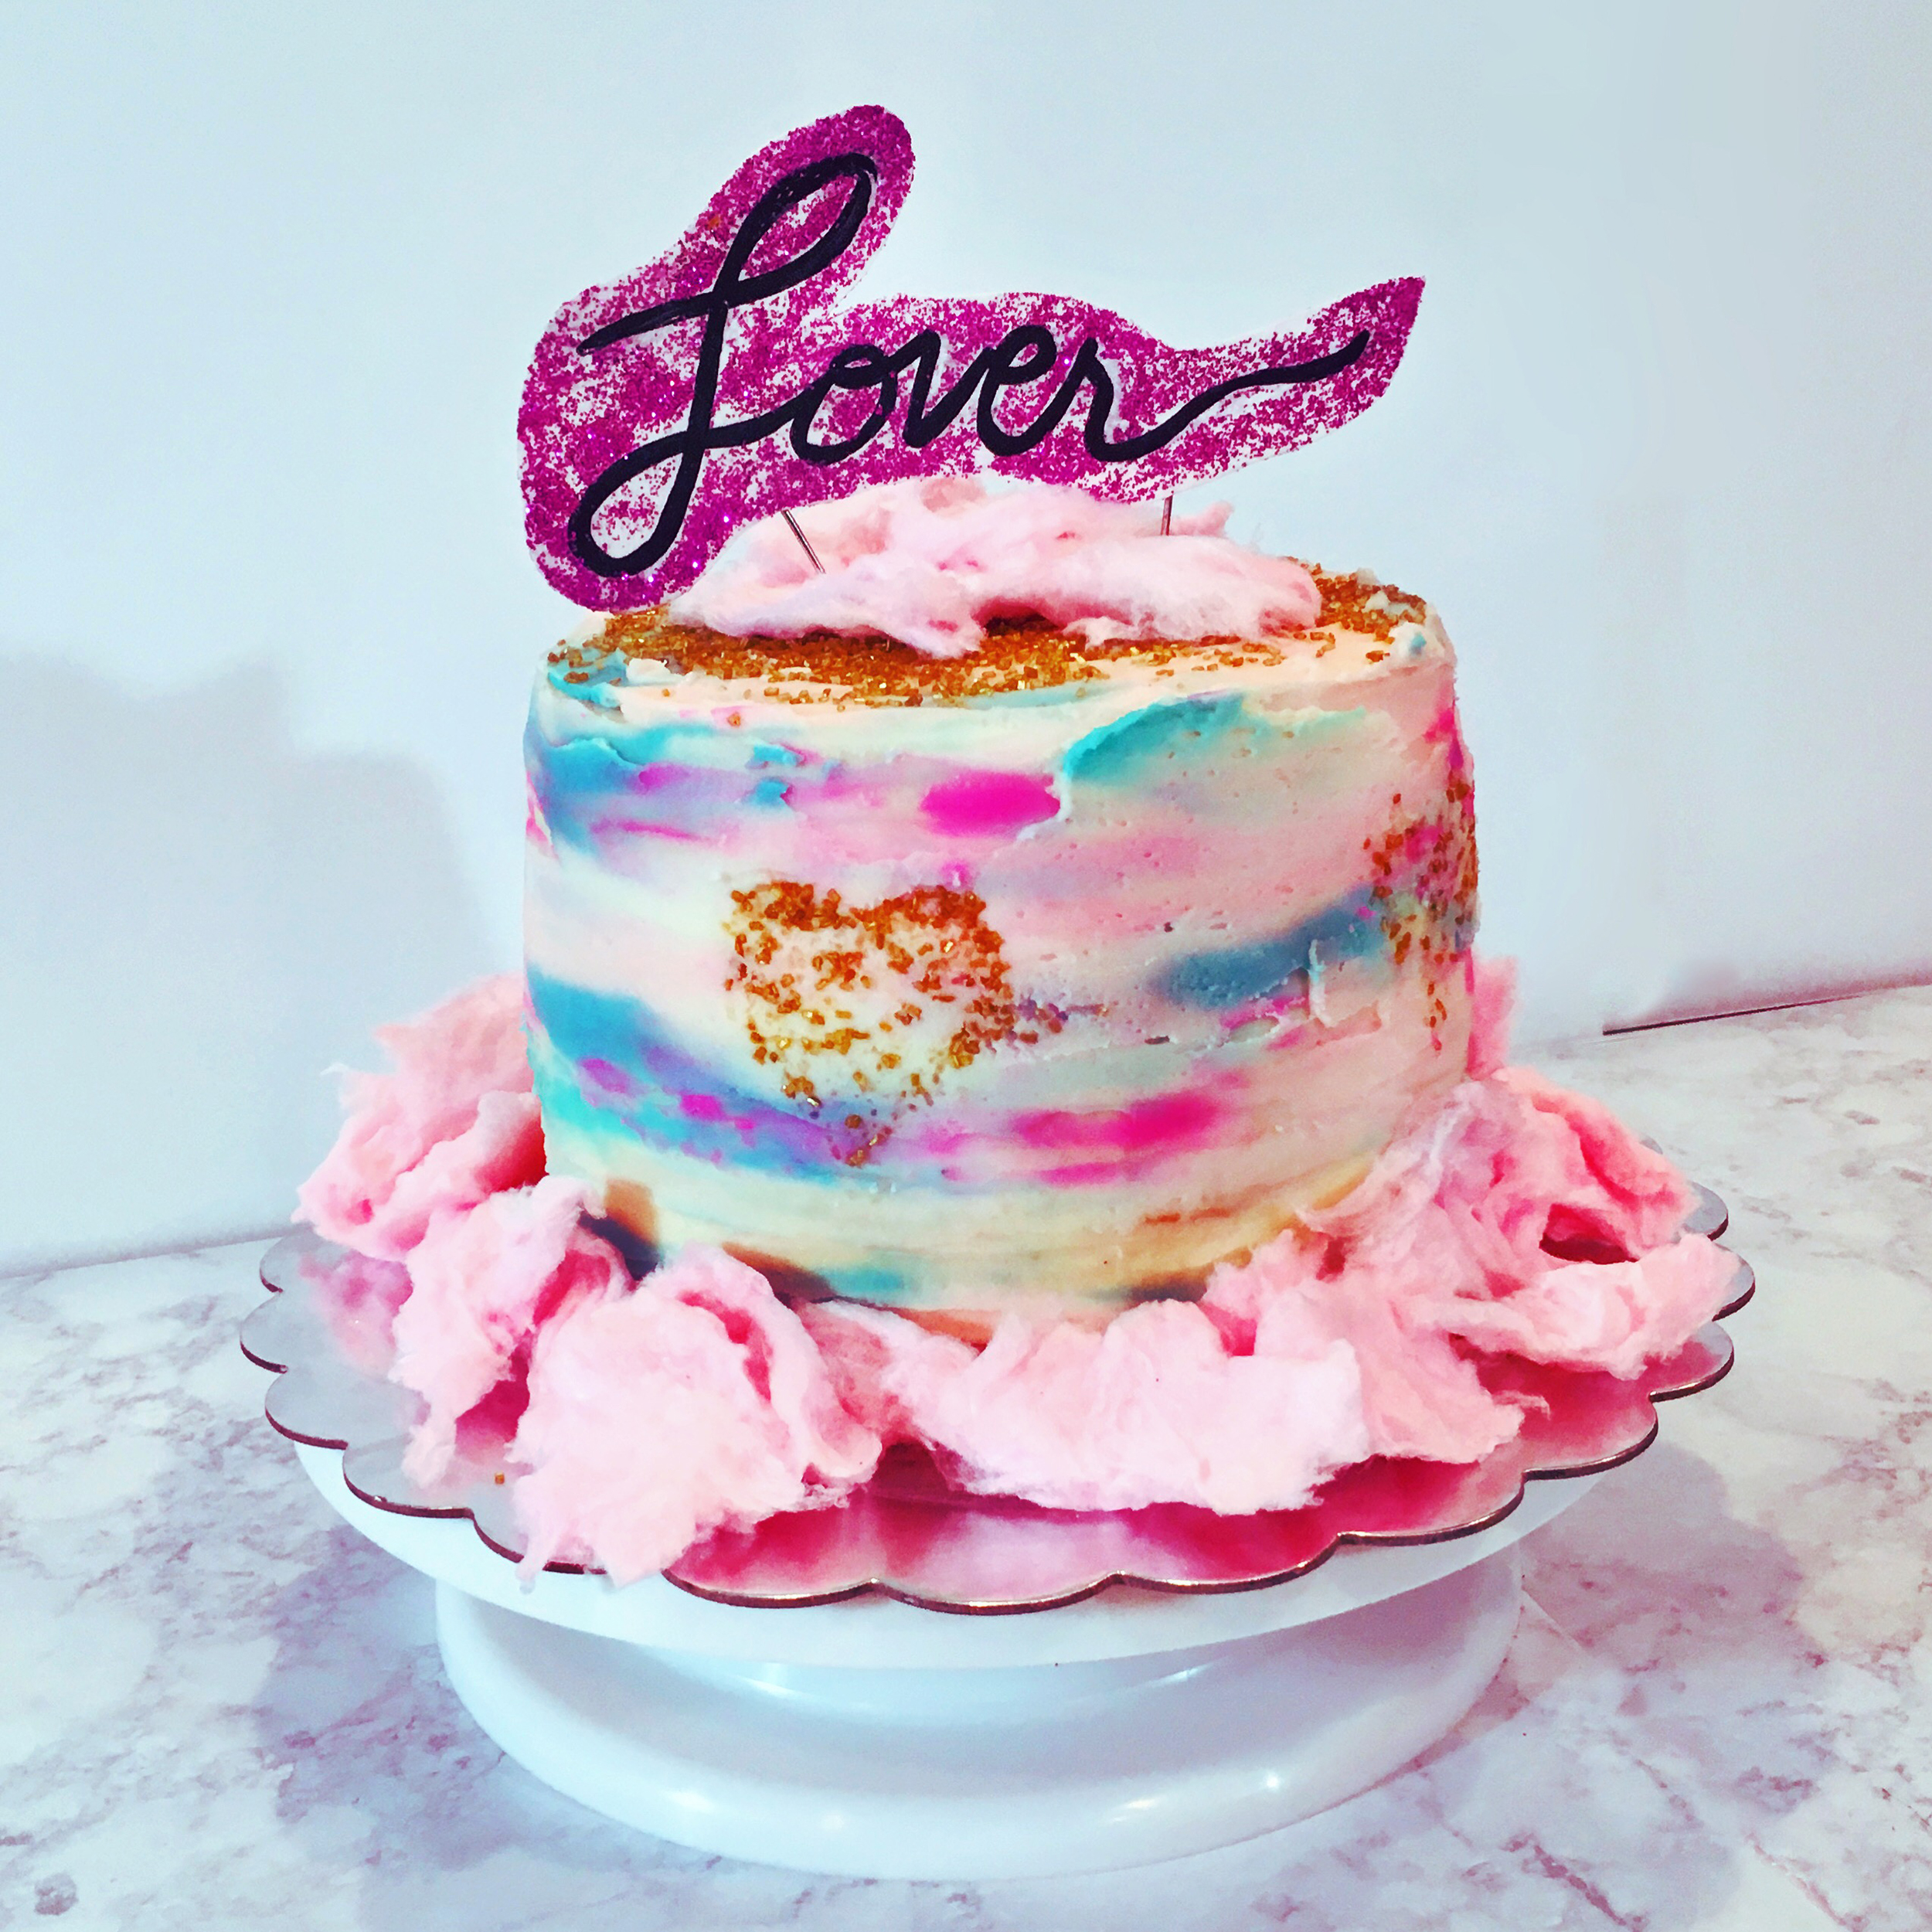 Awesome Taylor Swift Lover Confetti Cake The Sweet Spot Funny Birthday Cards Online Inifodamsfinfo